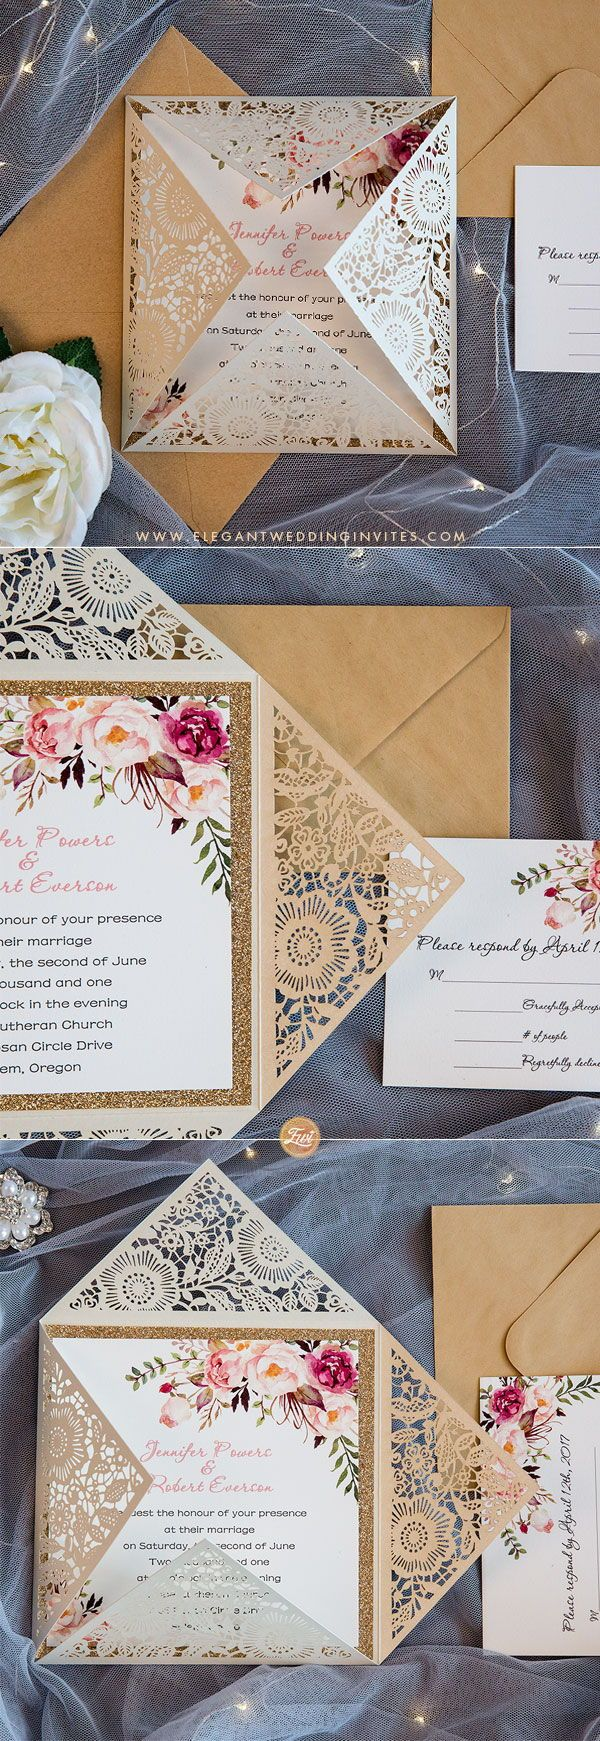 diy wedding invitations for second marriage%0A bohemian rustic spring flower glittery rose gold laser cut invitations  EWWS